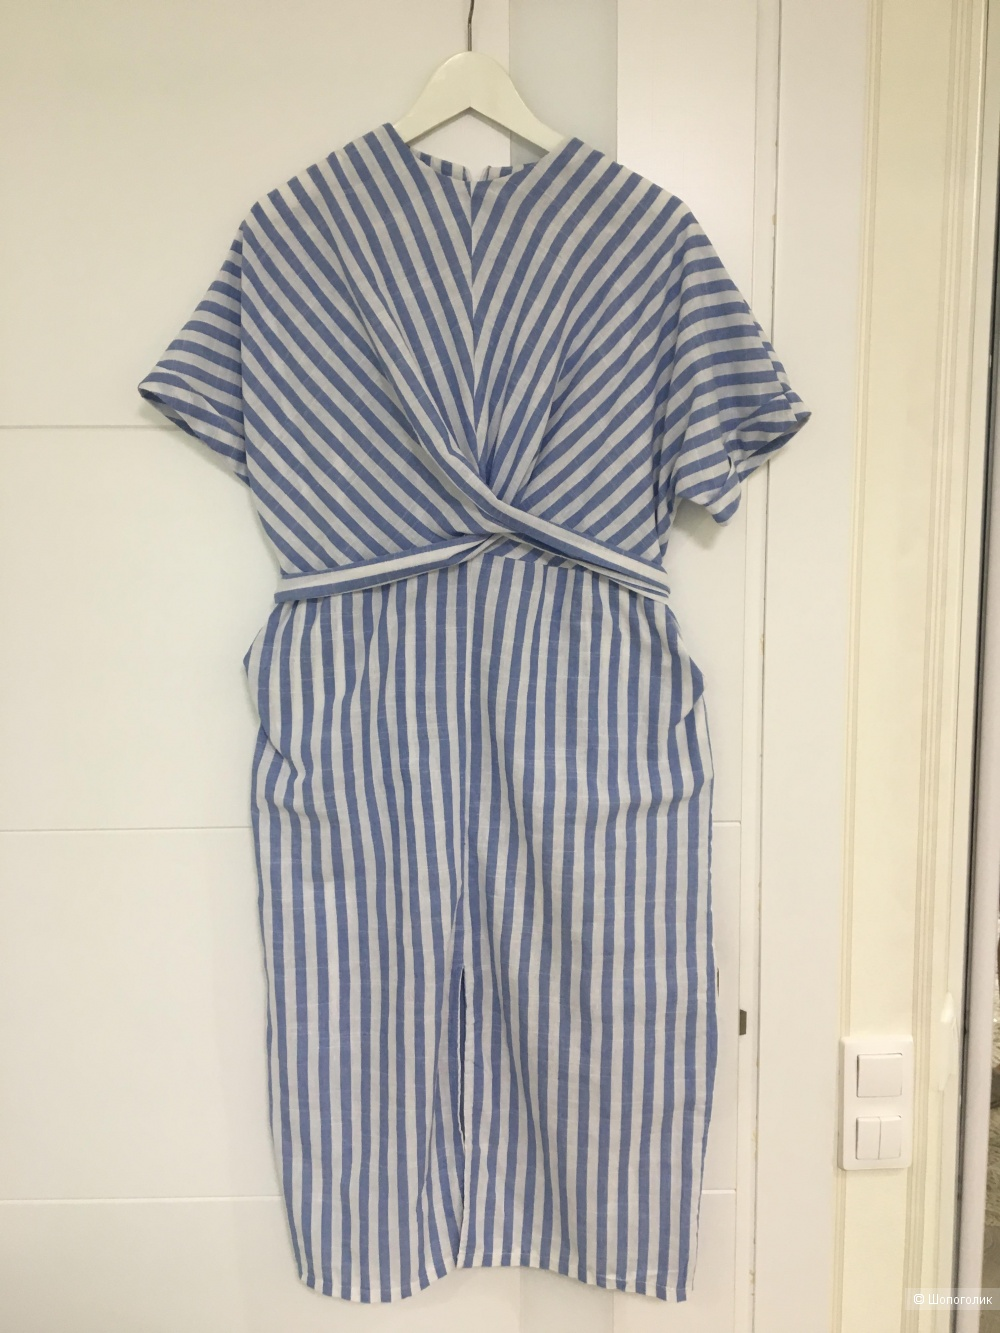 Платье, , бренд only one, размер м